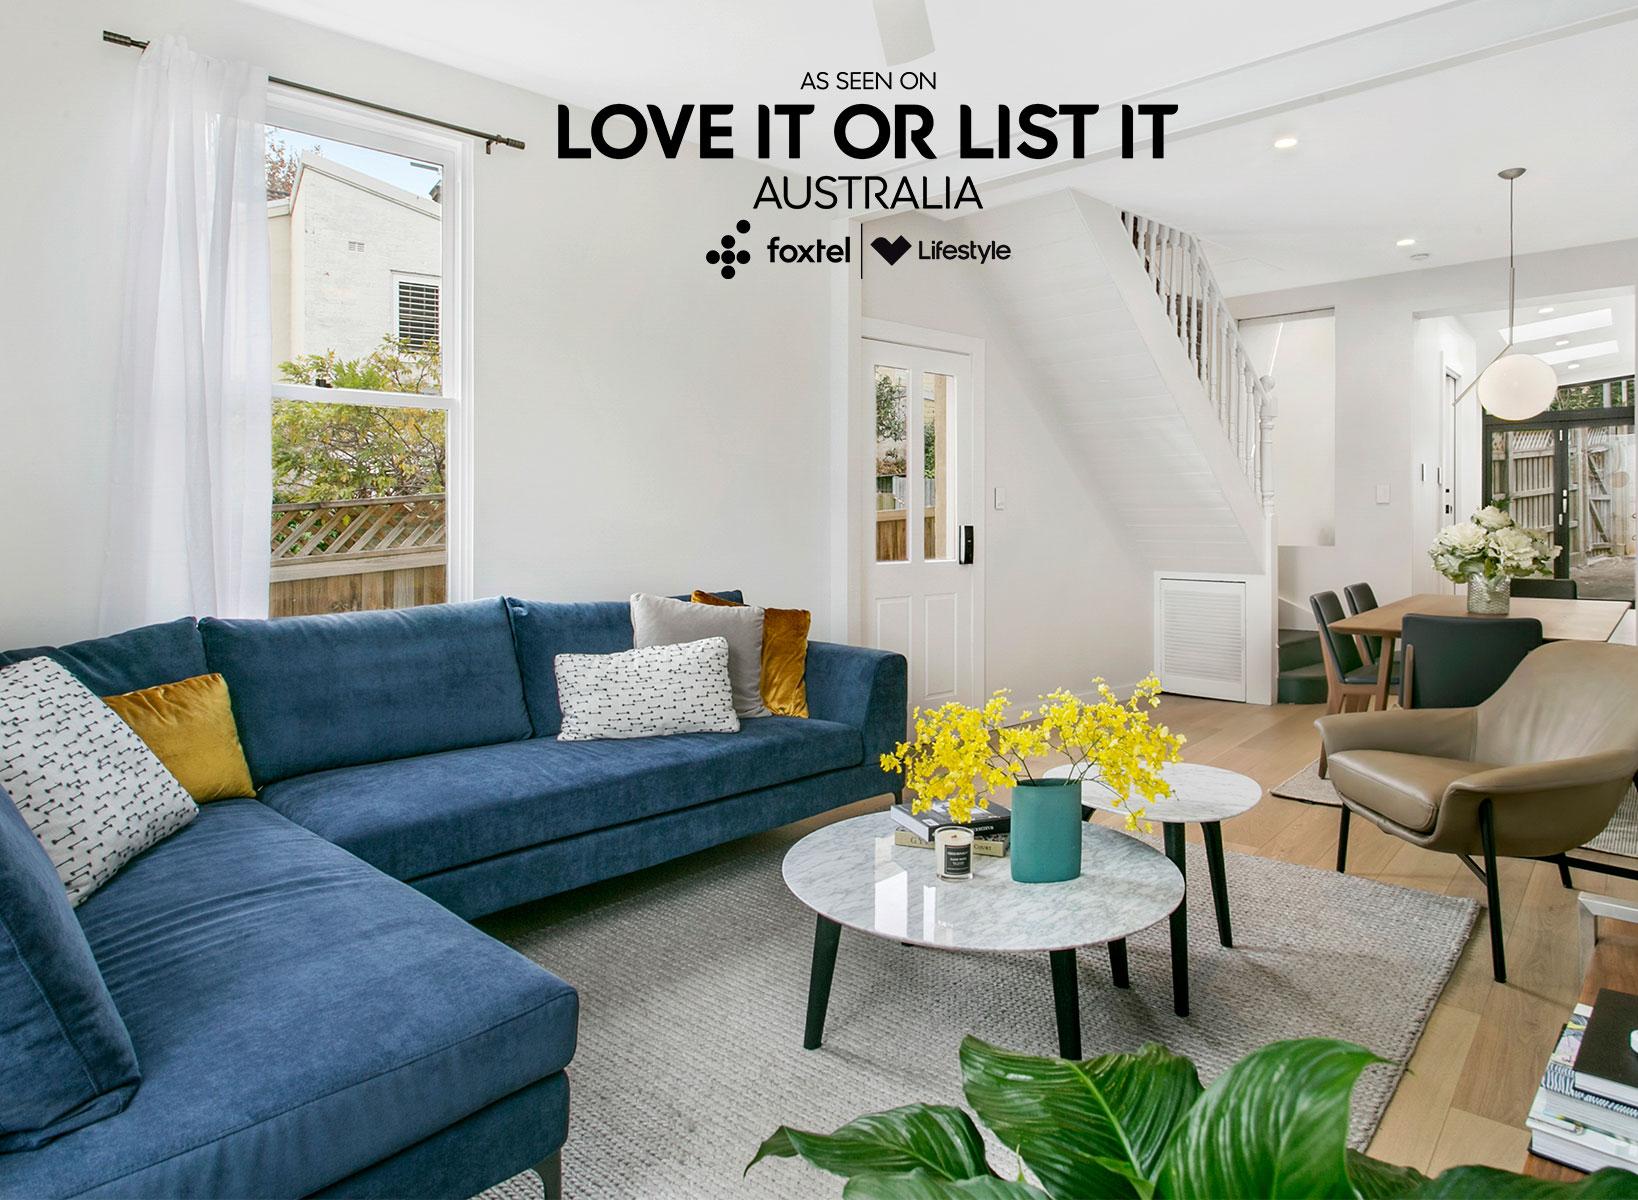 Love It Or List It Episode 4 - King Living